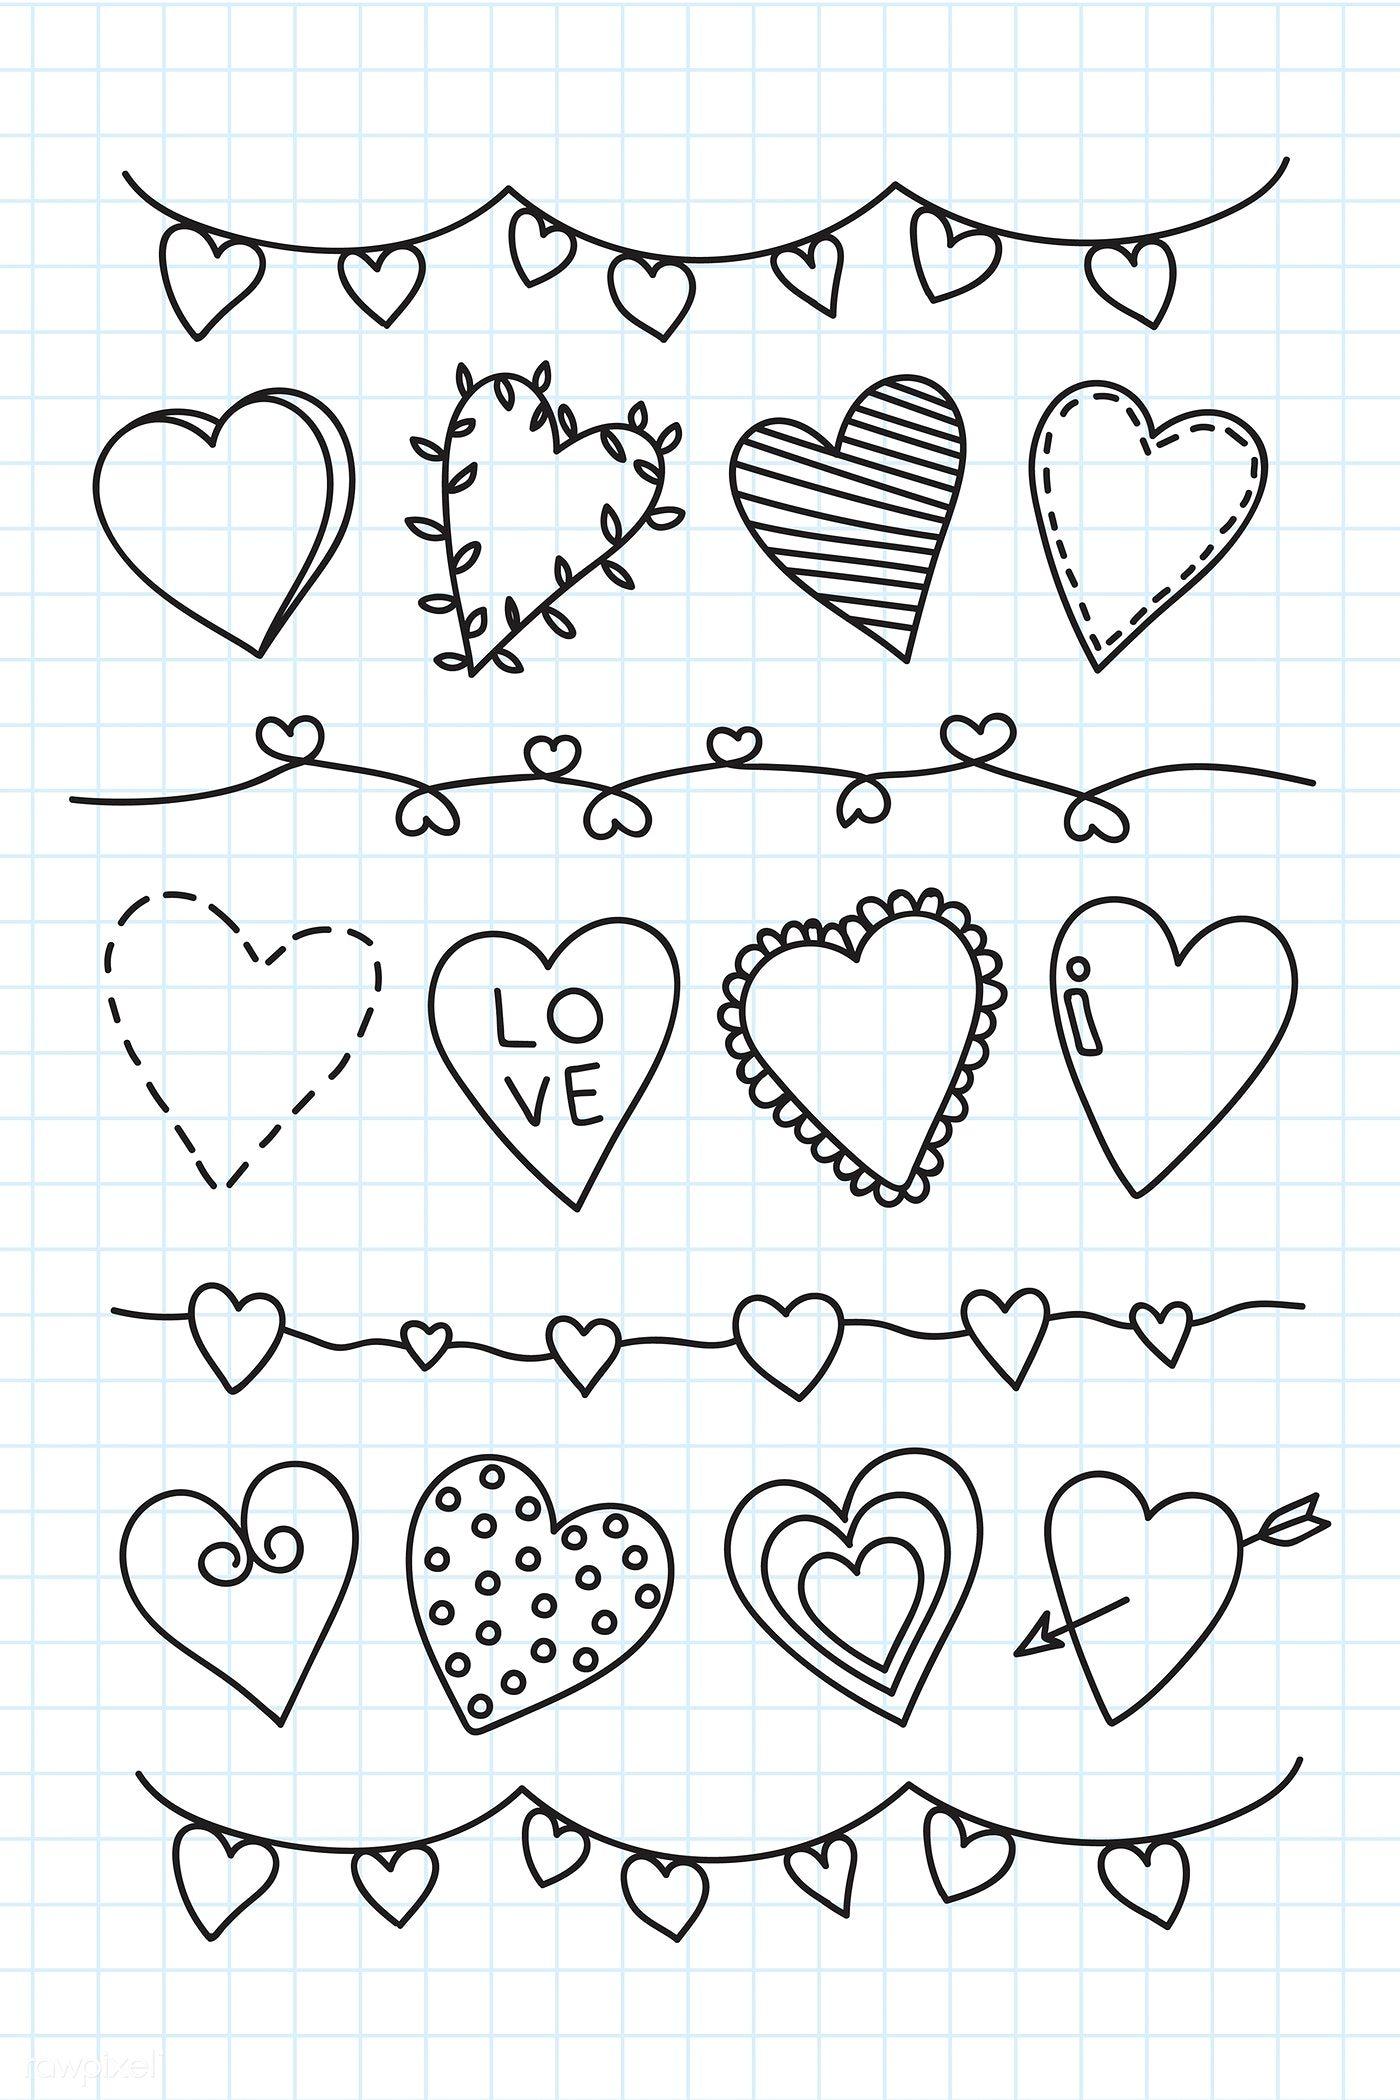 Download premium illustration of Hand drawn heart doodle